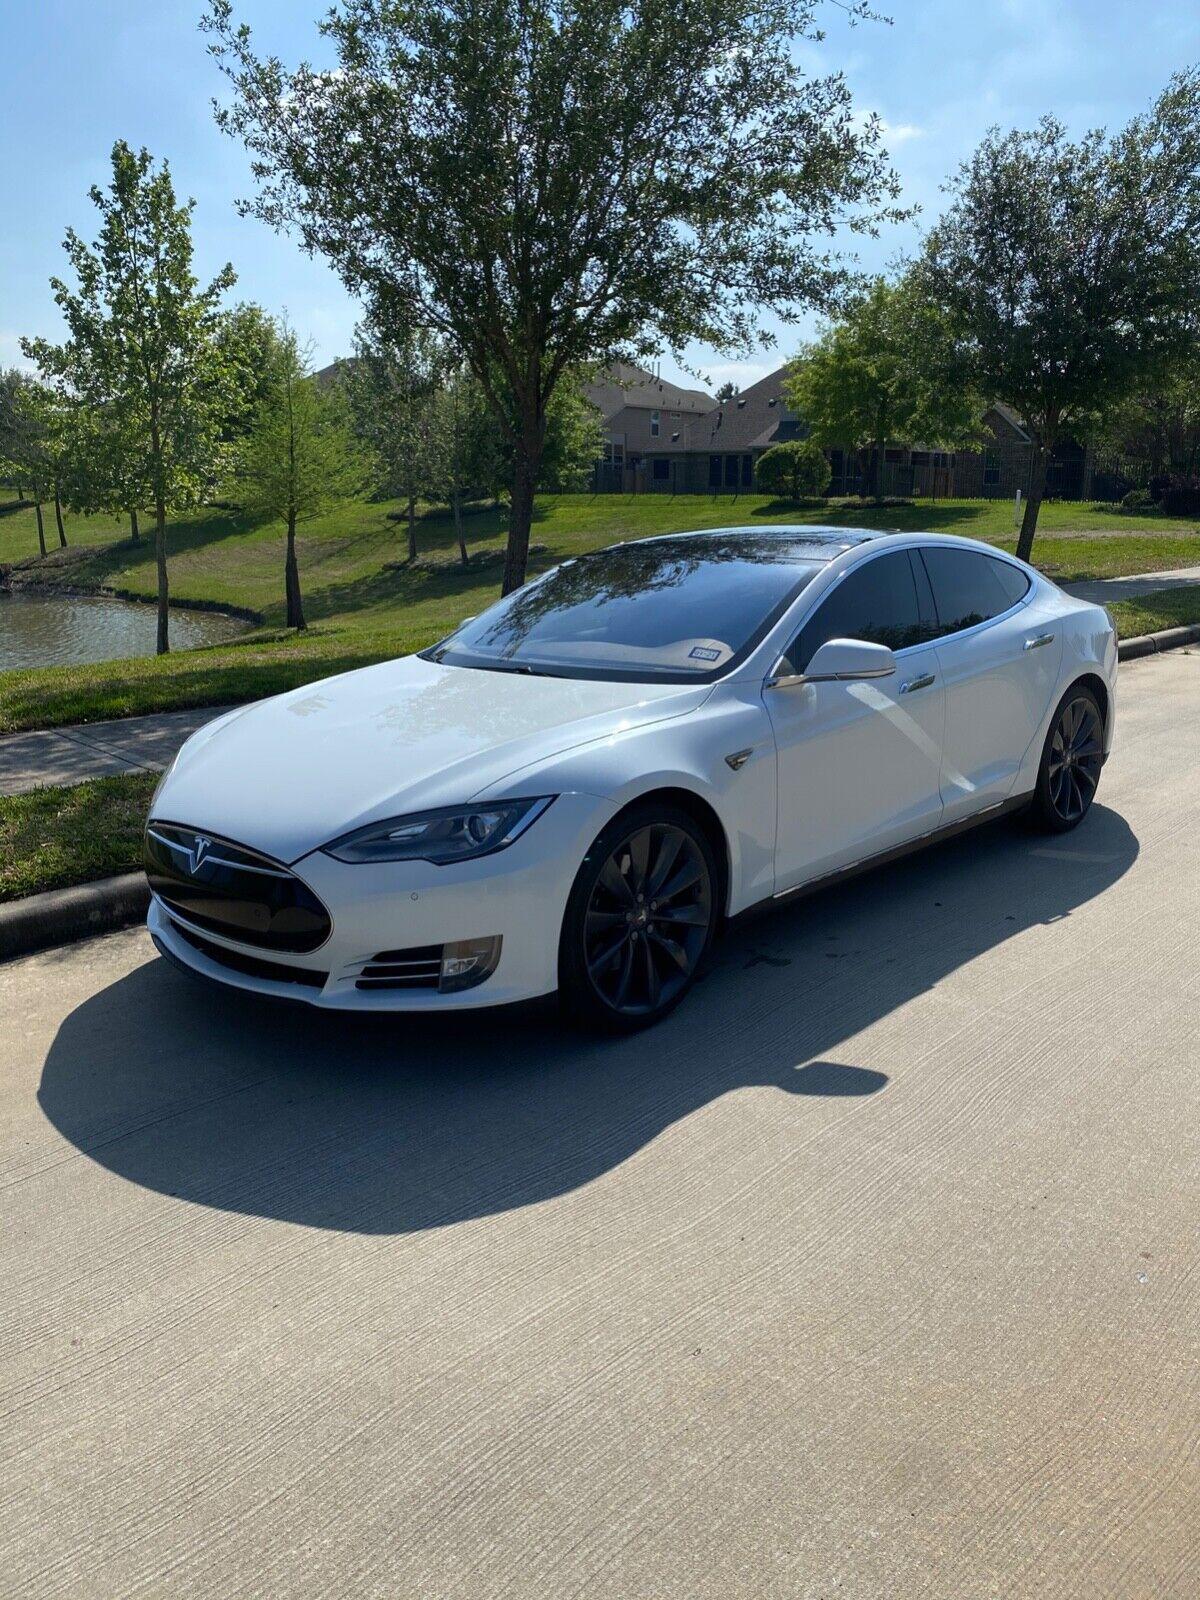 Image 1 Coche Americano usado Tesla Model S 2014